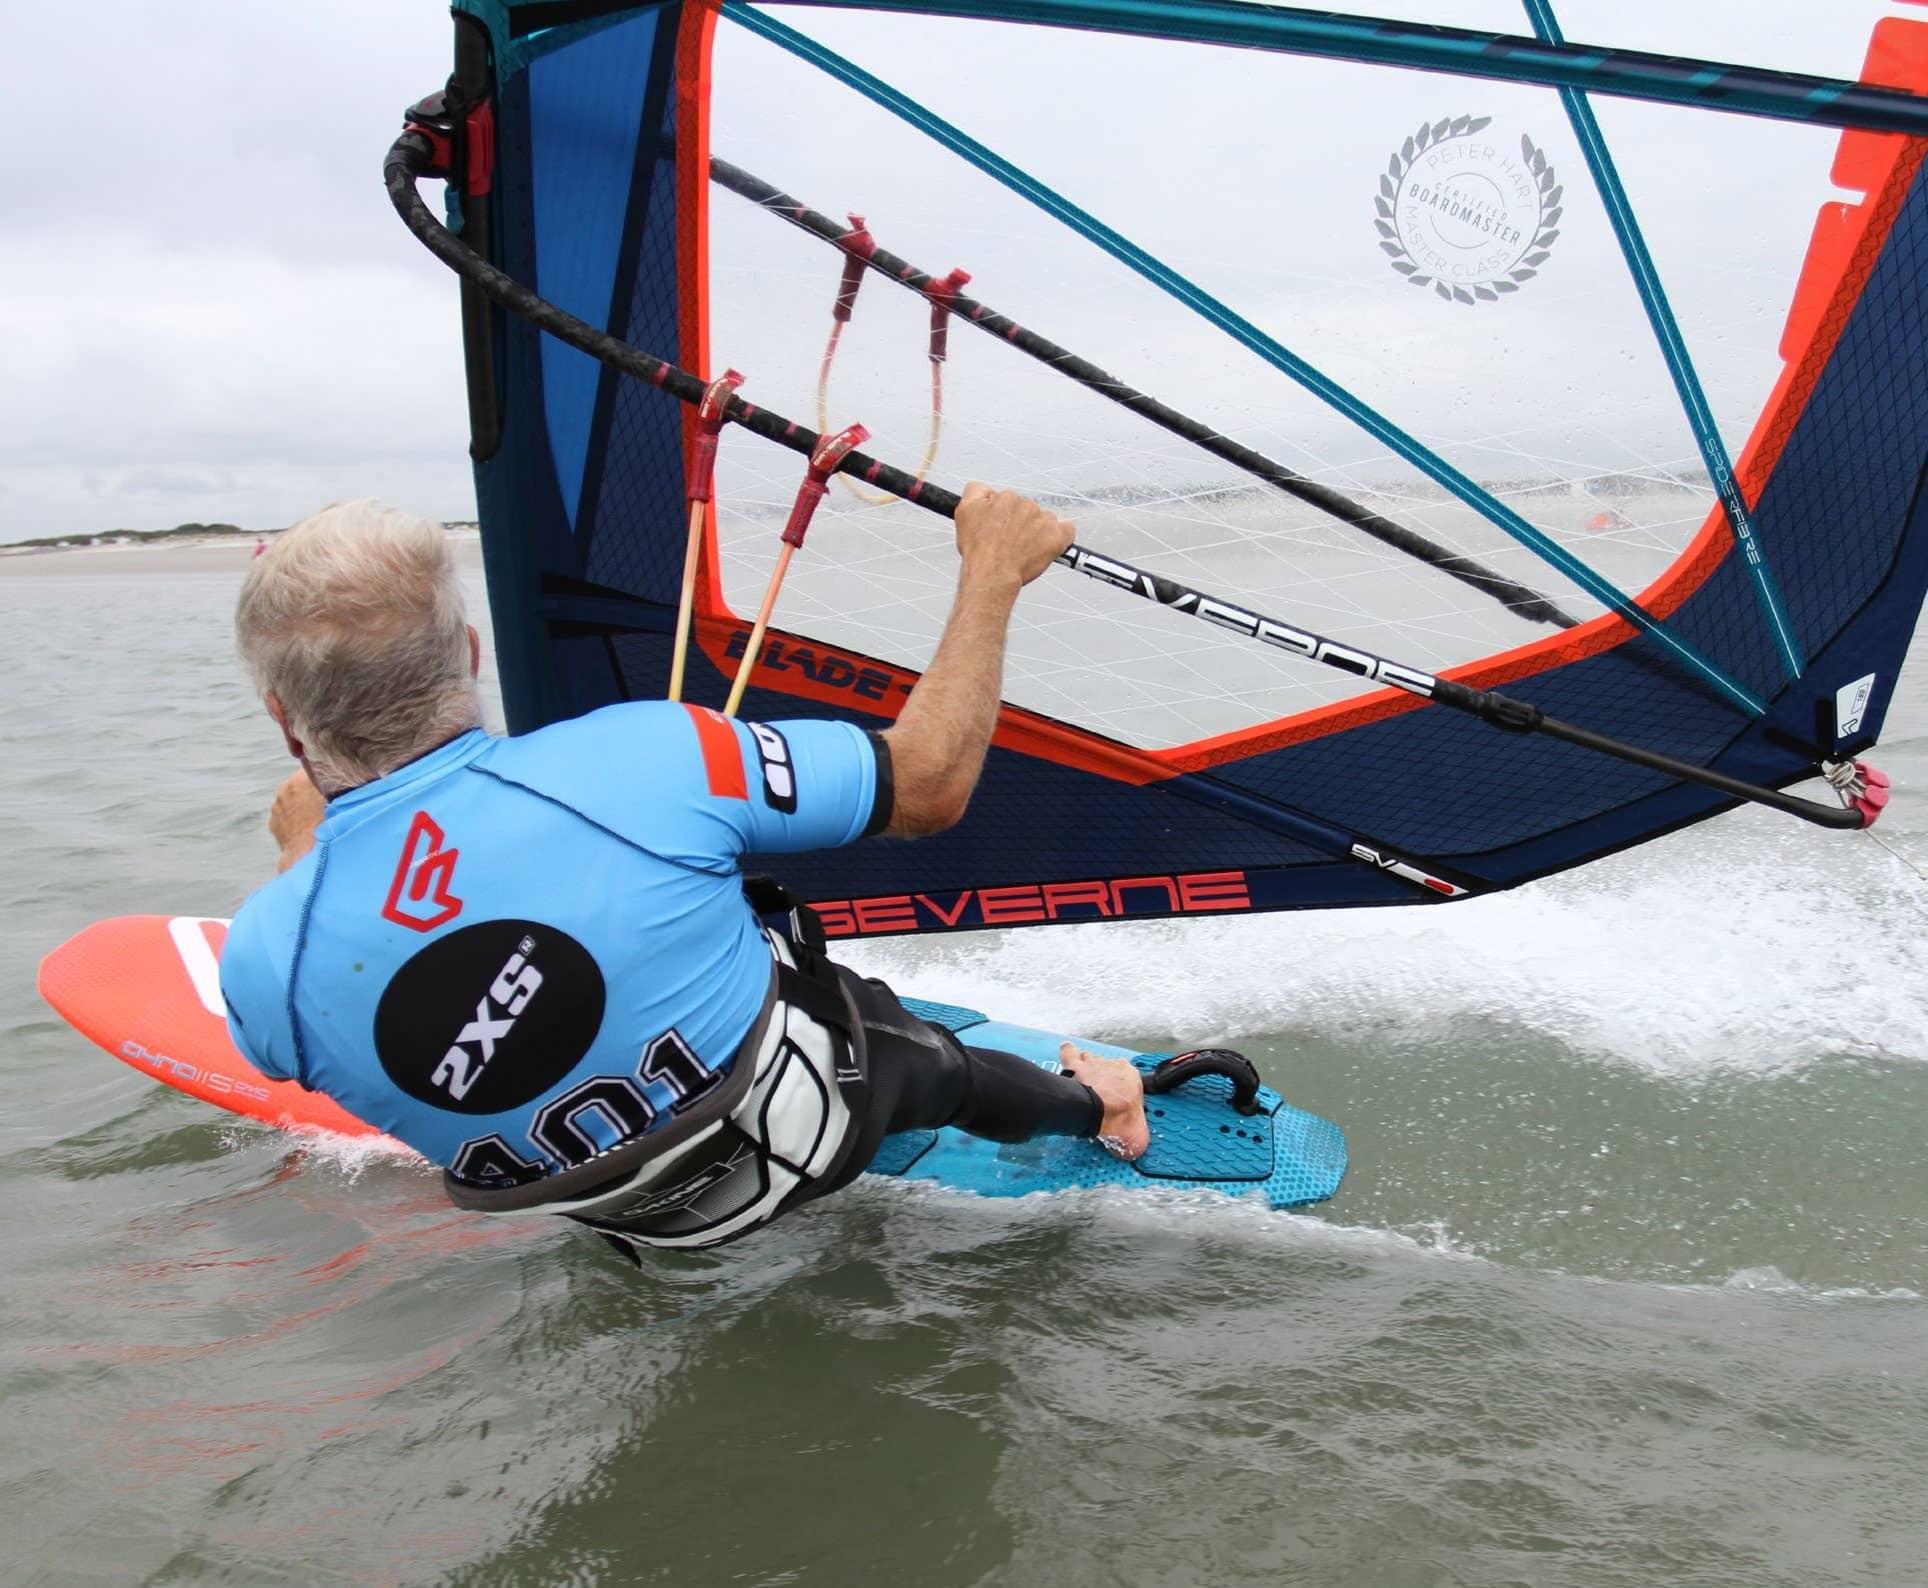 Peter Hart Masterclass - Staying Upwind-the Ultimate Balancing Act